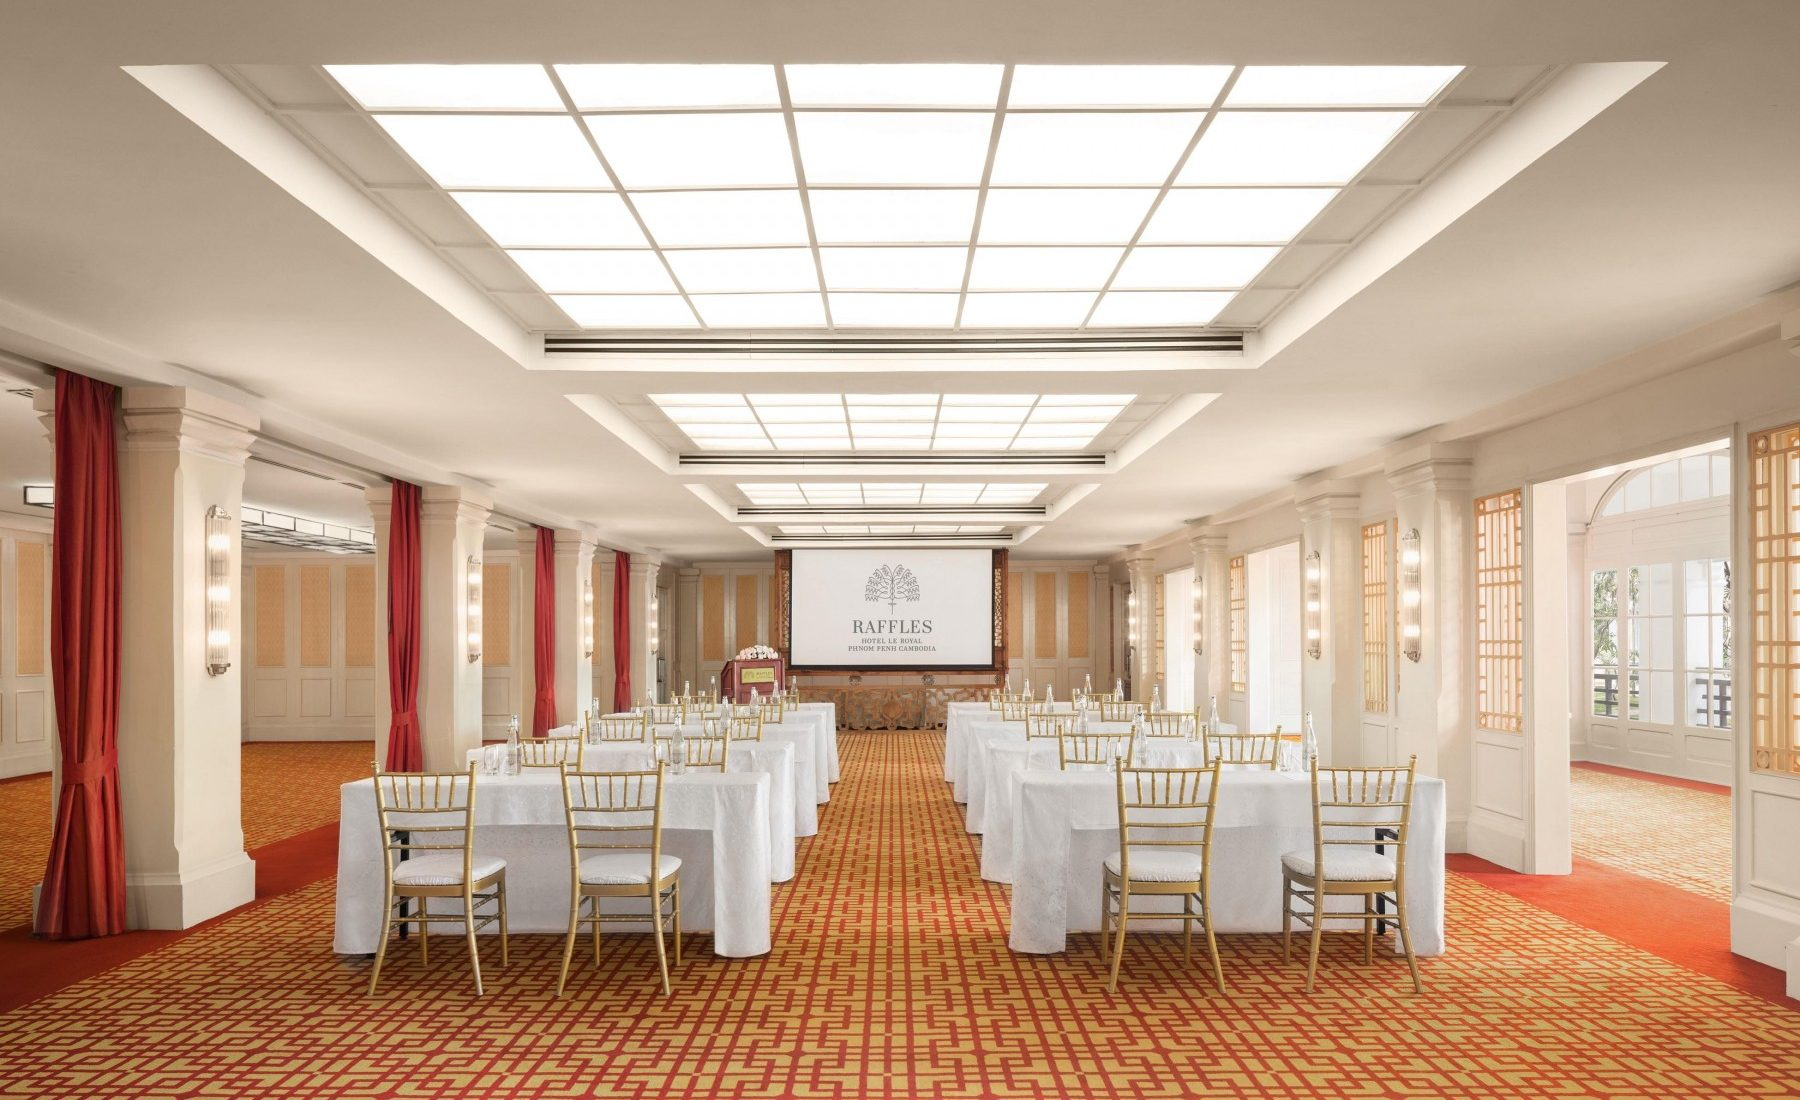 Raffles Hotel Le Royal Phnom Penh - Corporate Events